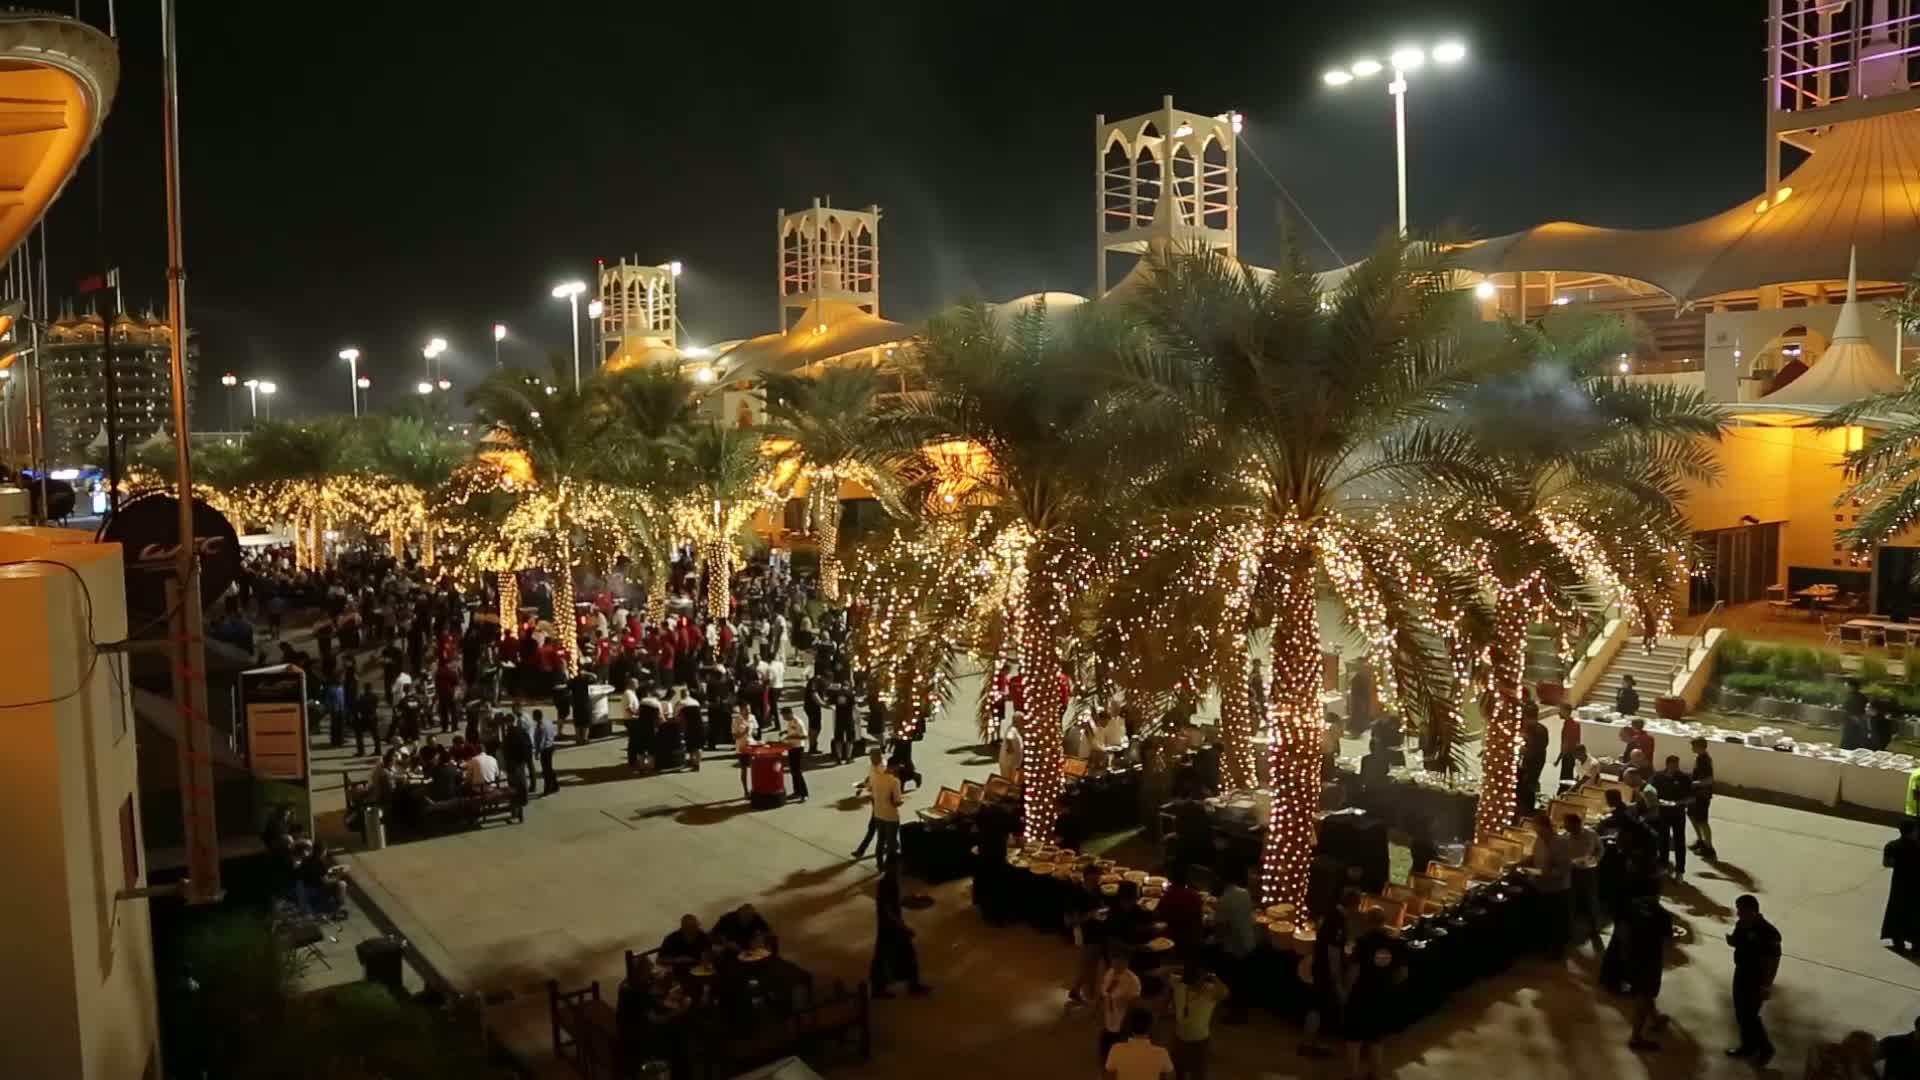 60 Seconds of Audi Sport 101/2015 - WEC Bahrain, Paddock Dinner